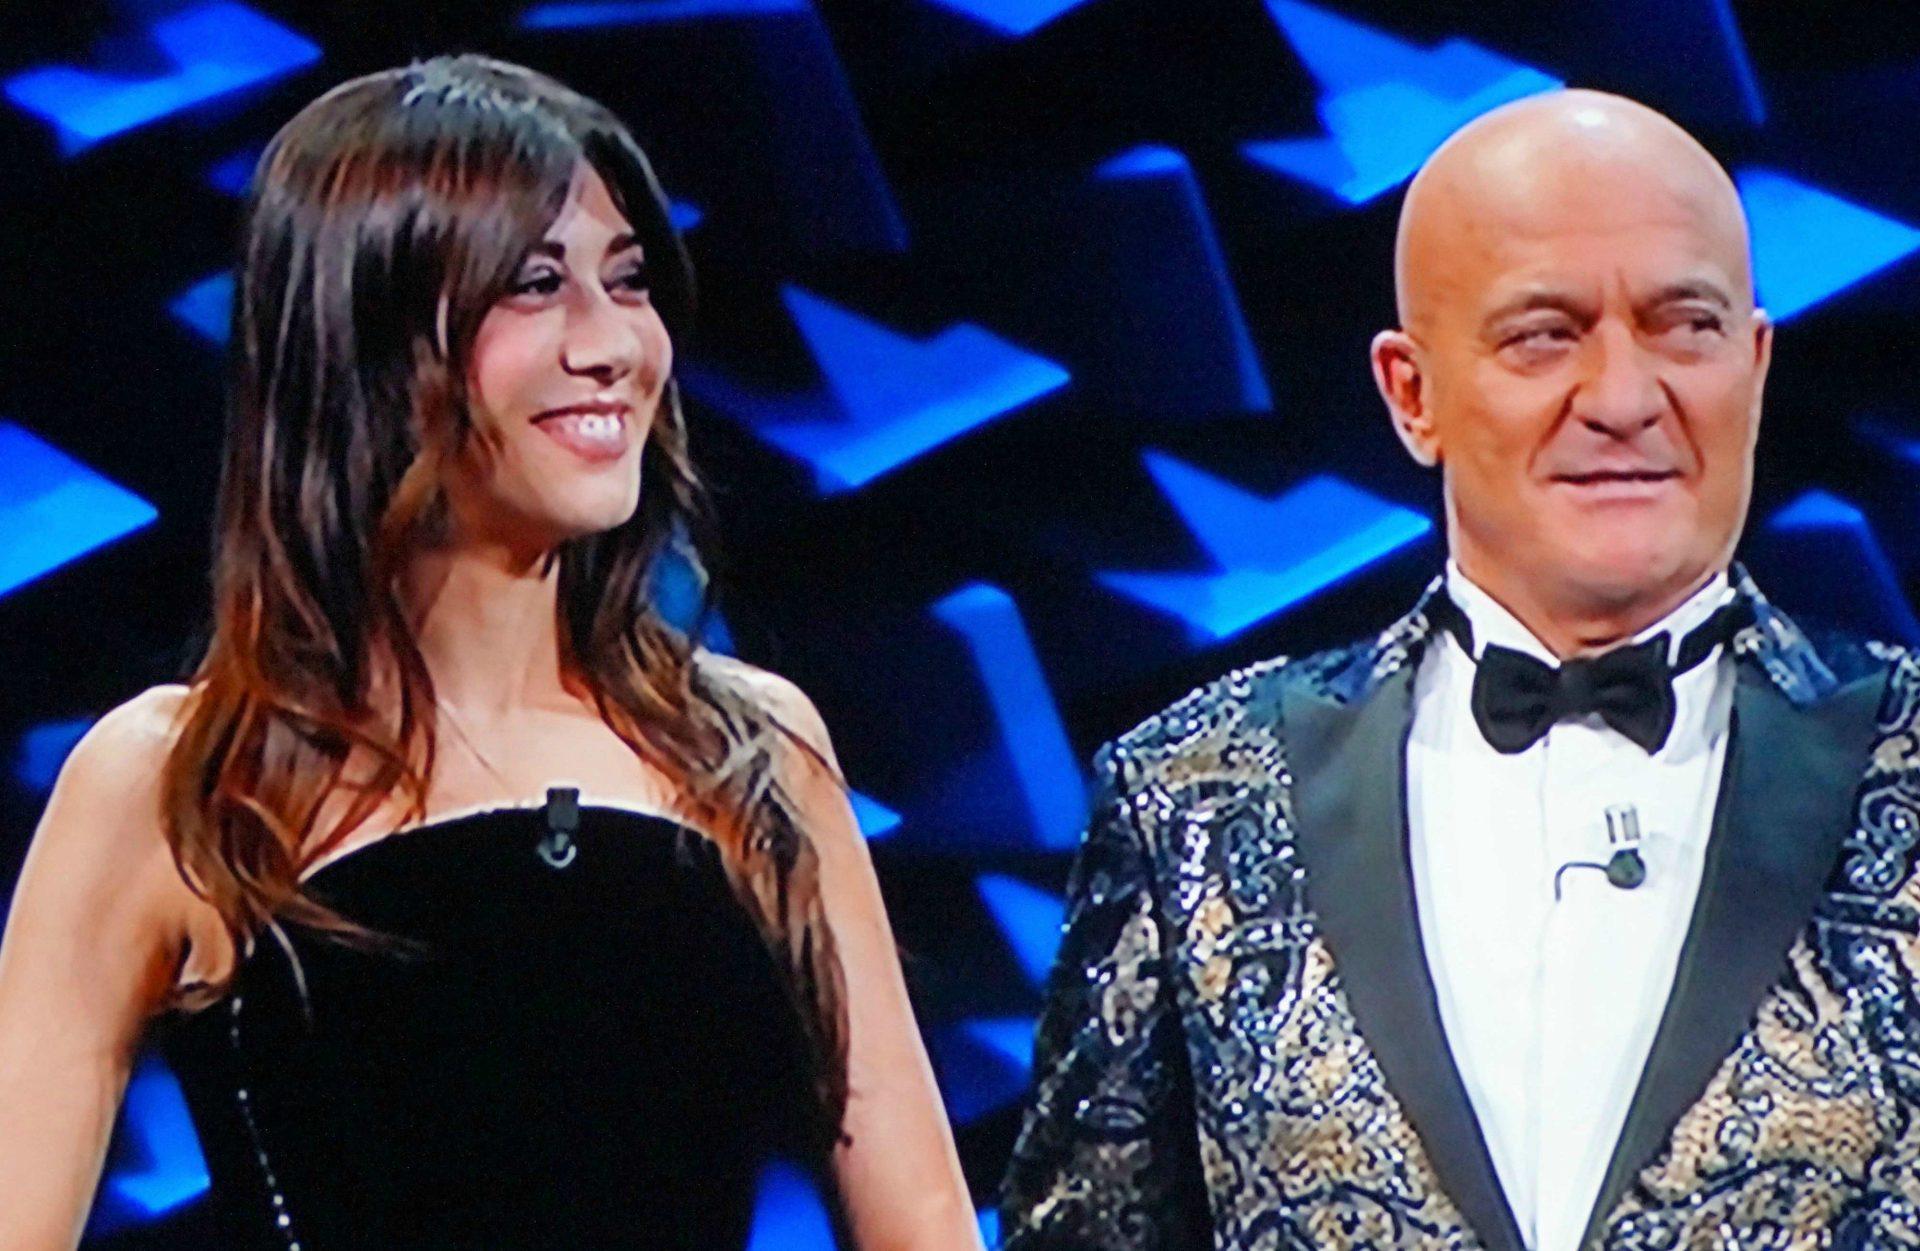 Biosio Raffaele virginia sanremo 2019